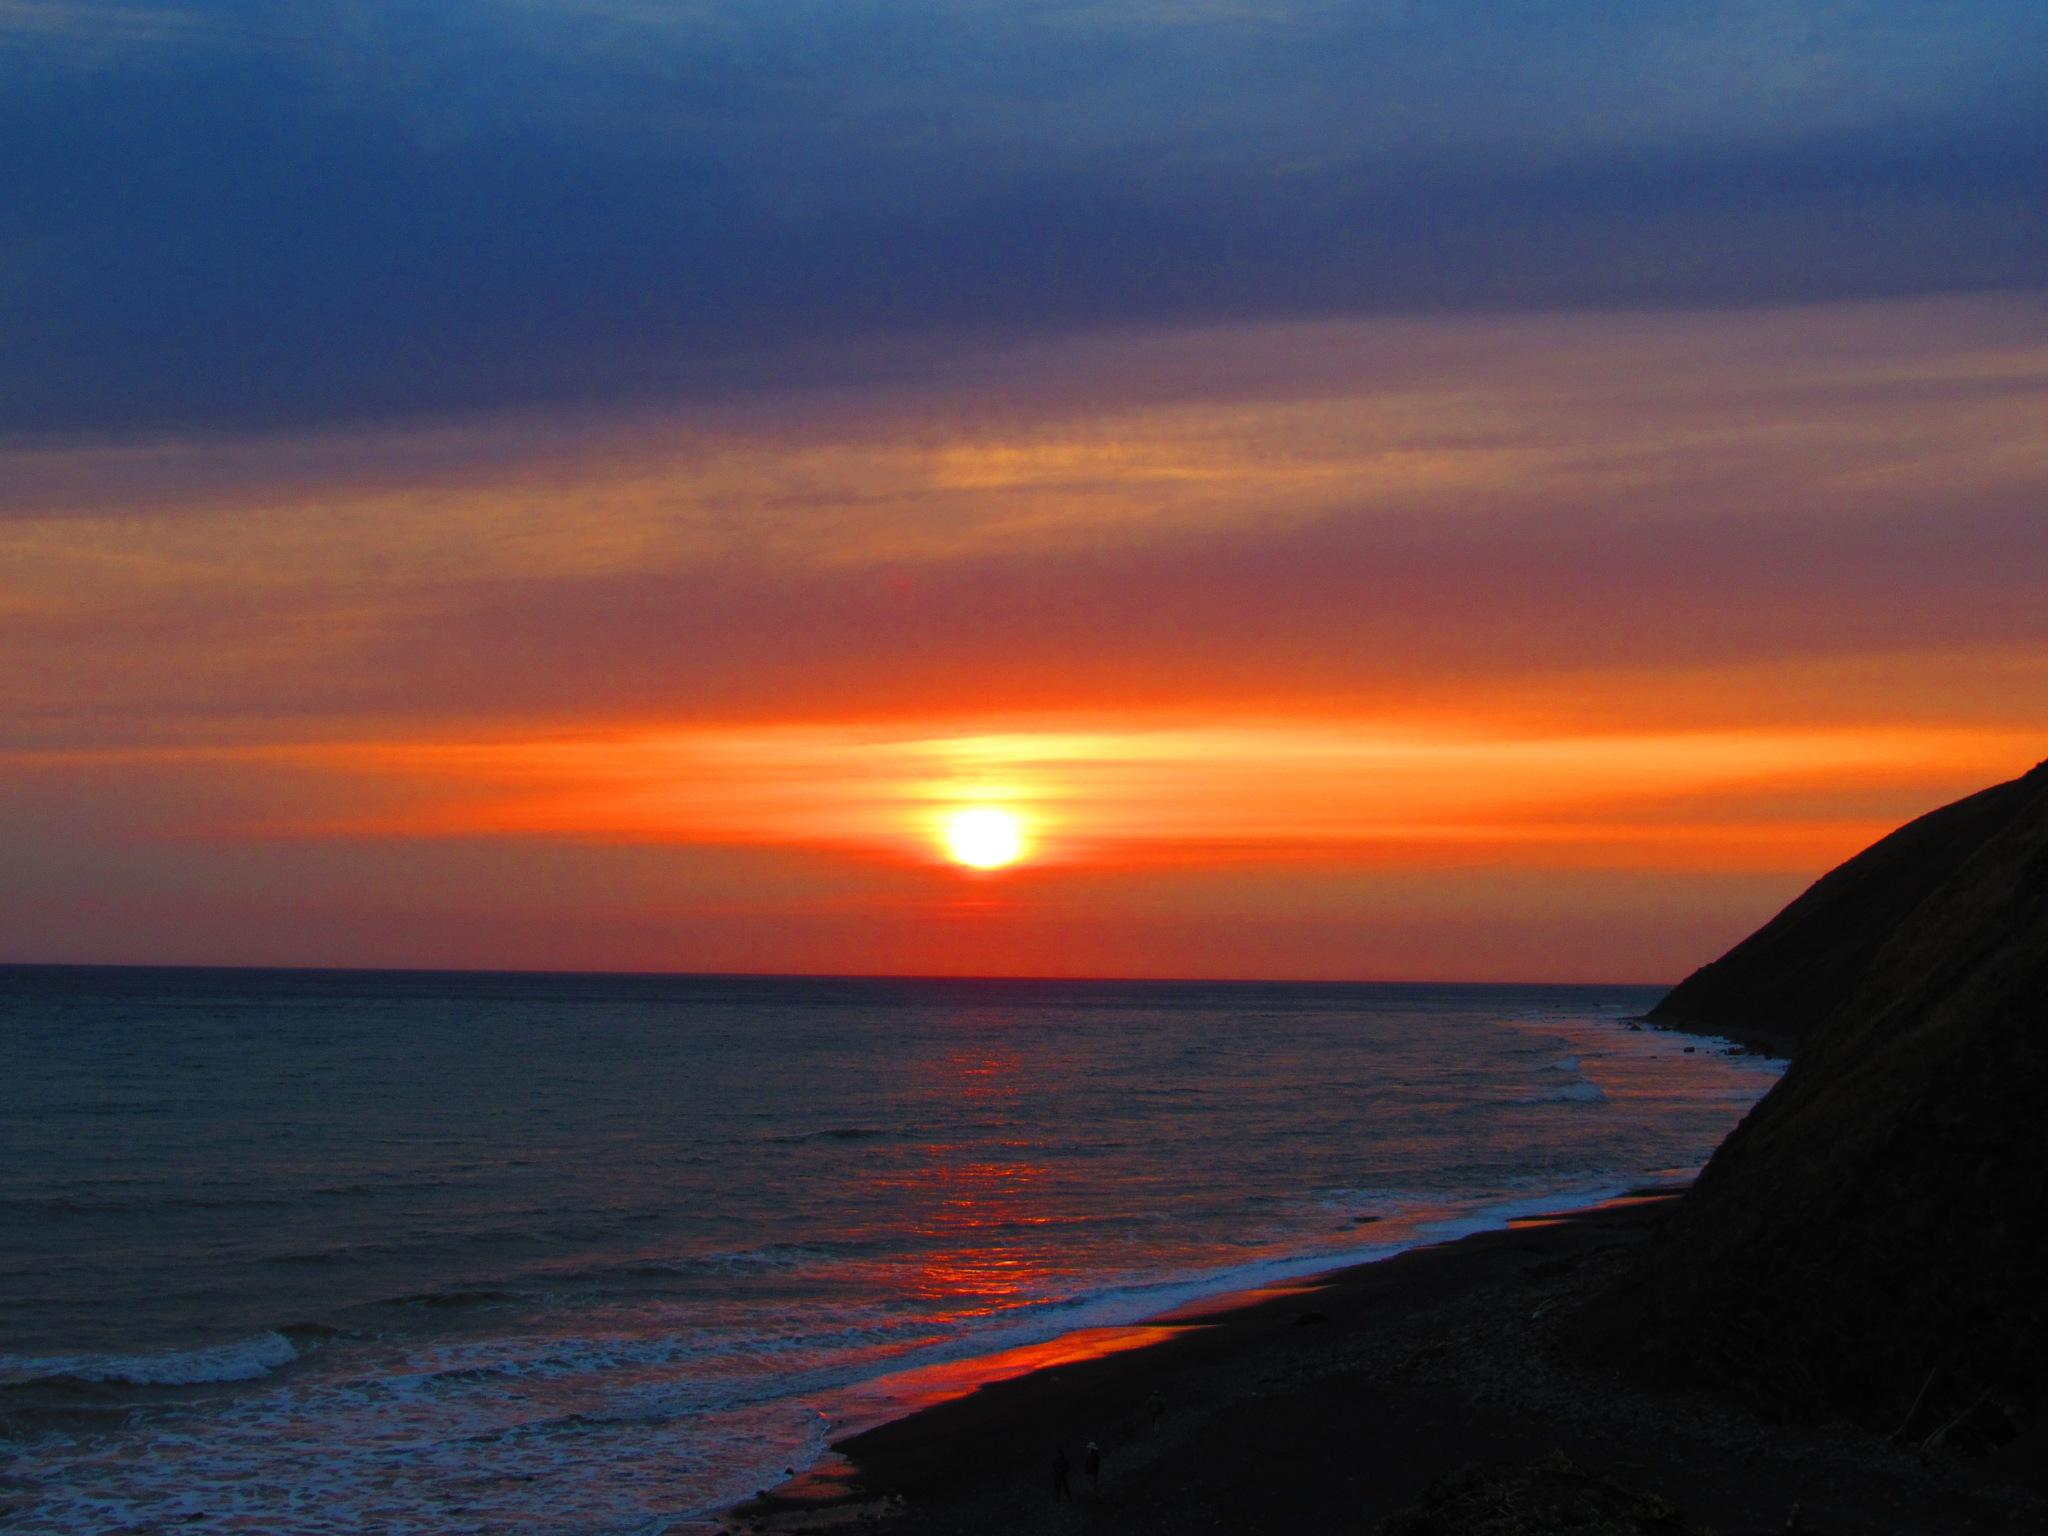 Coastal Warmth by Samantha Acker